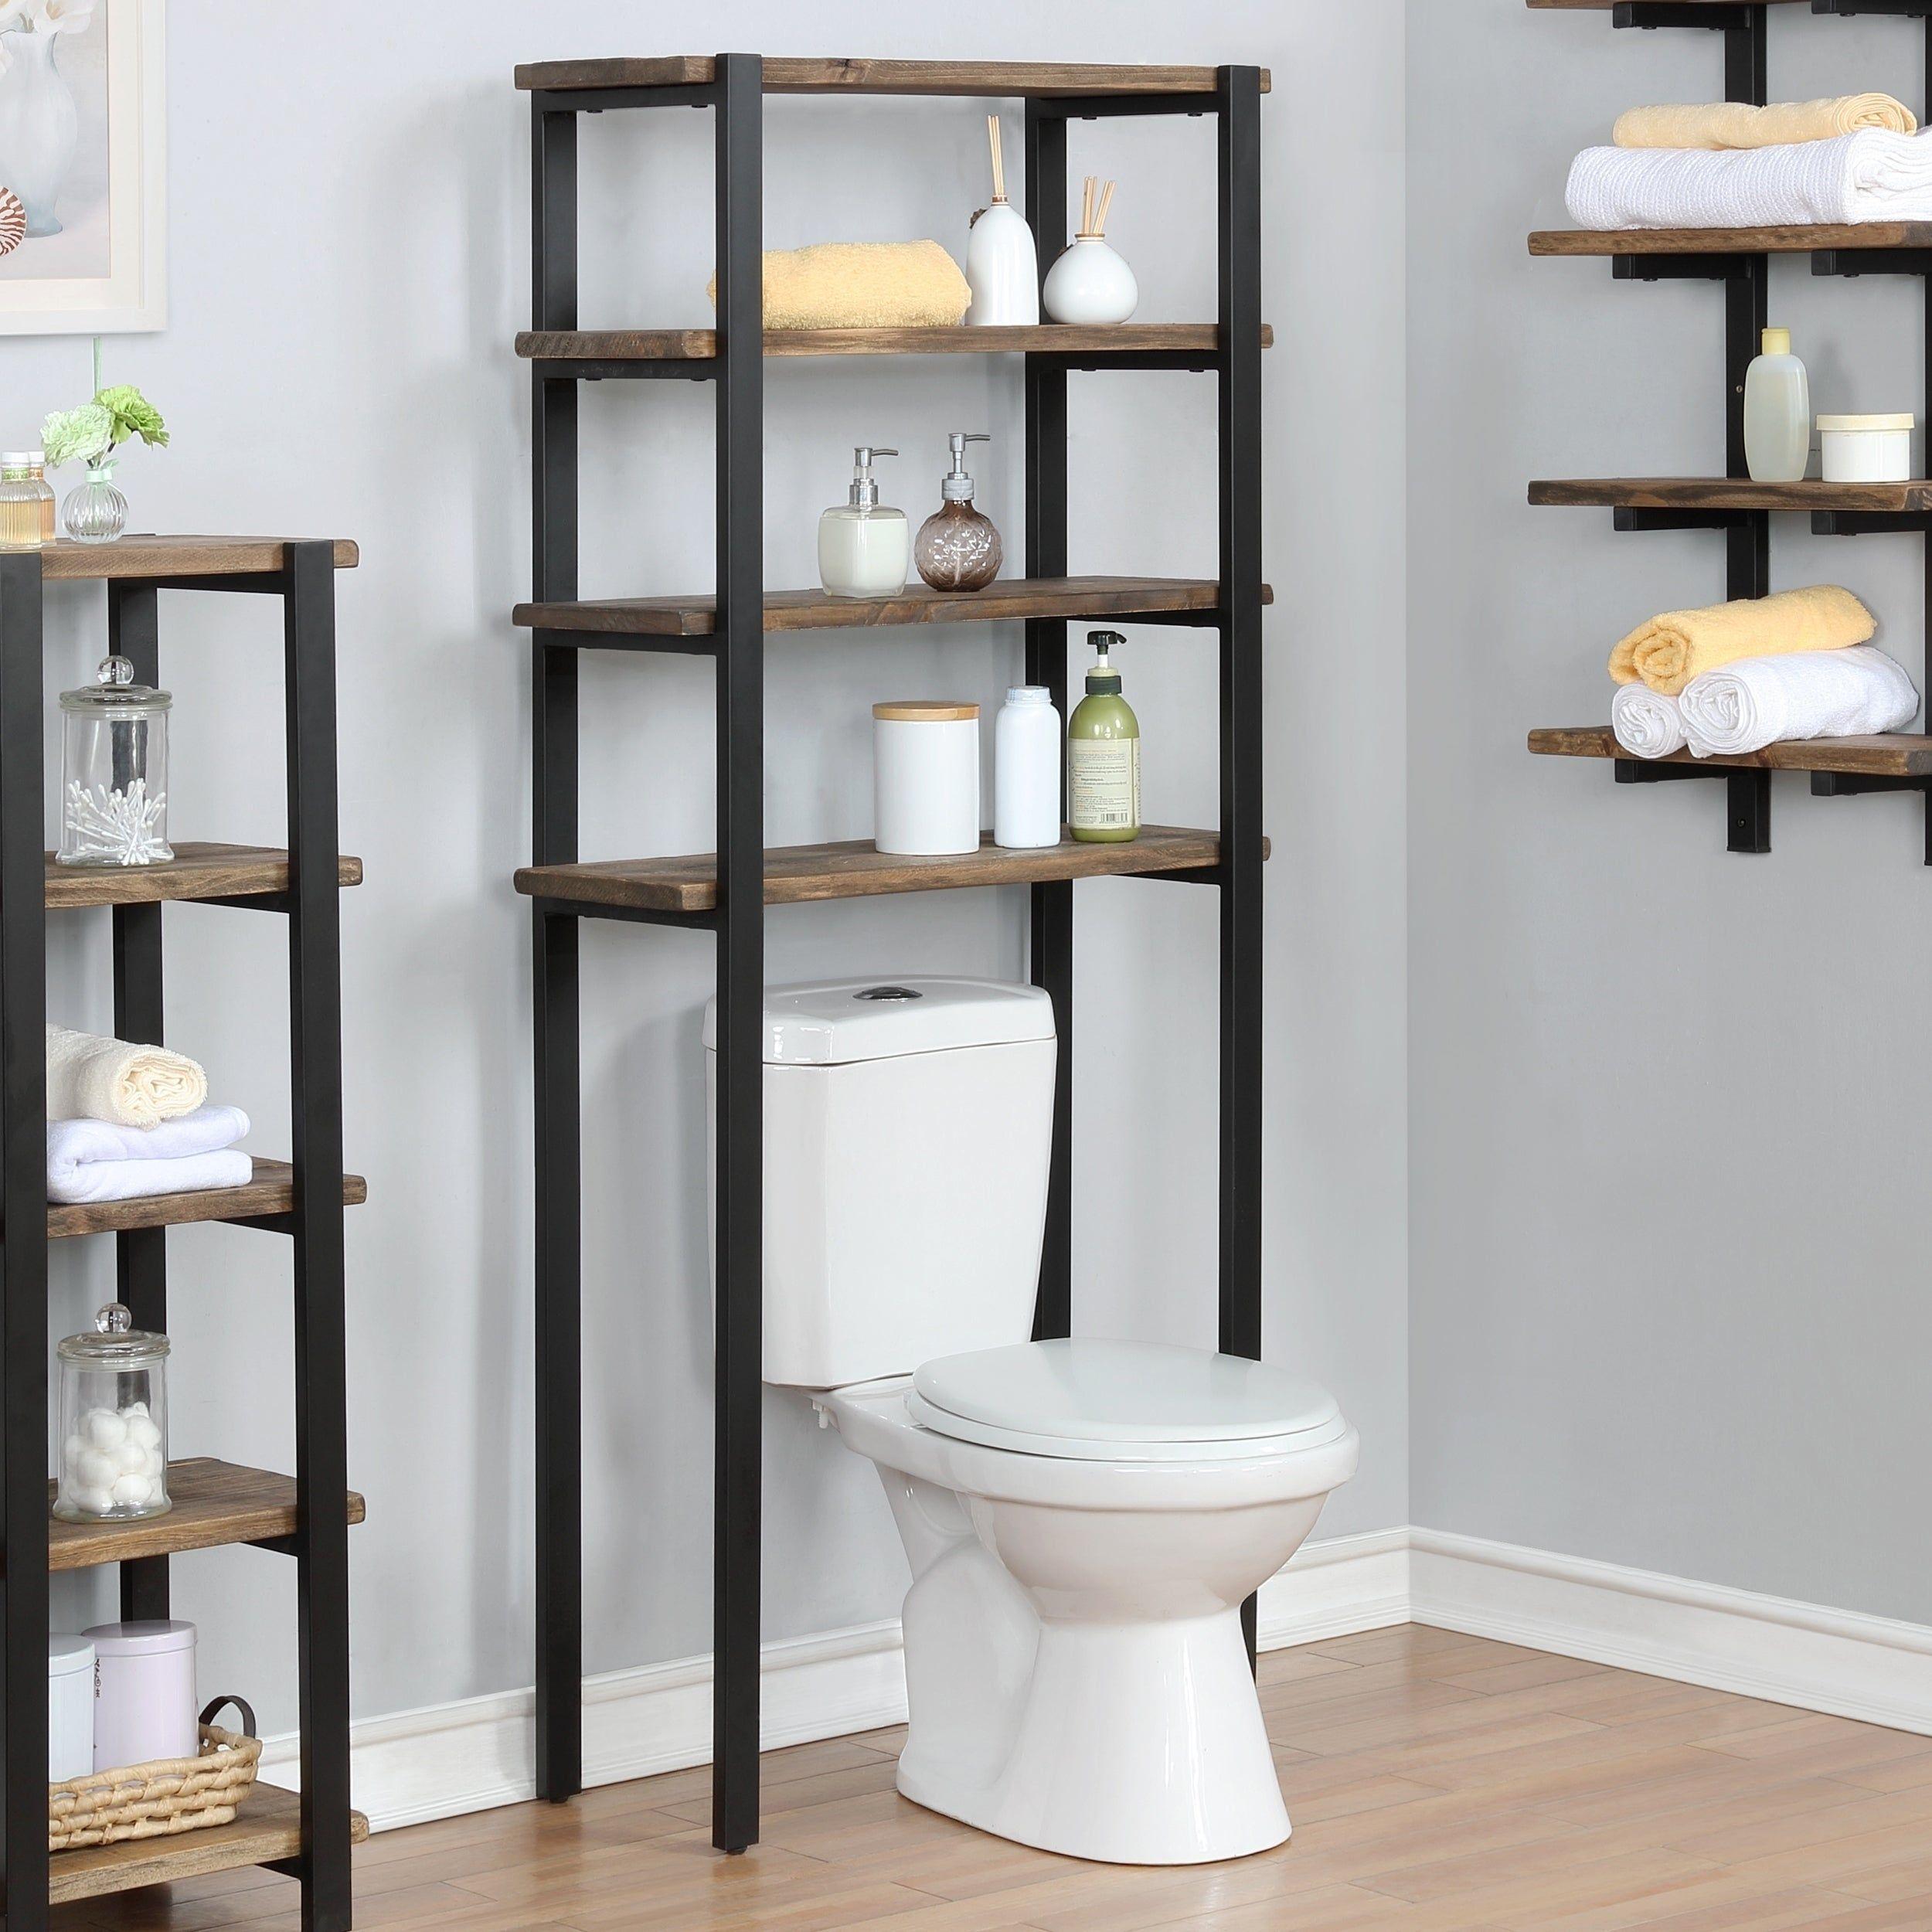 26 Contemporary Bathroom Storage Over Toilet Toilet Storage